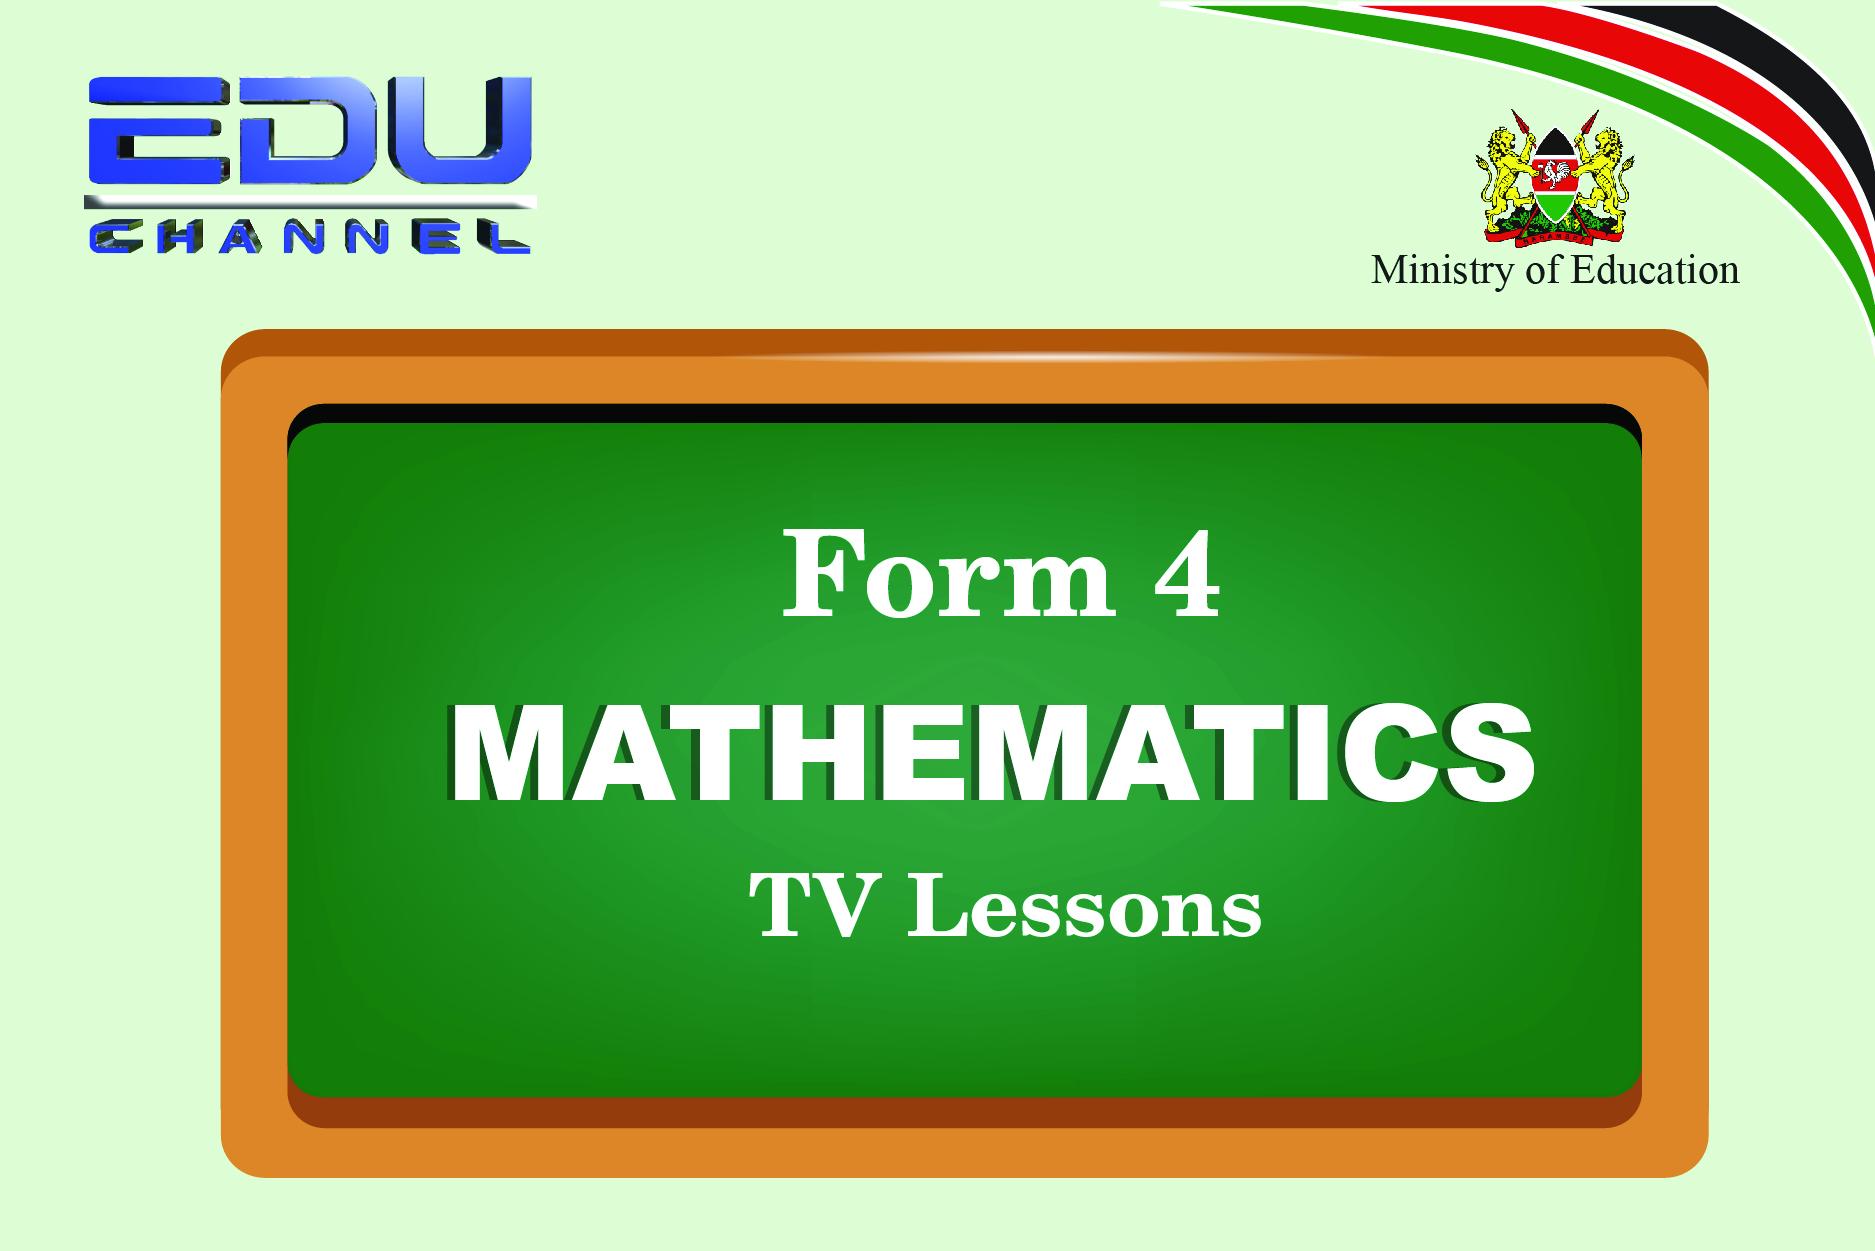 Form 4 Mathematics Lesson 13: Differentiation-Derivative of polynomial